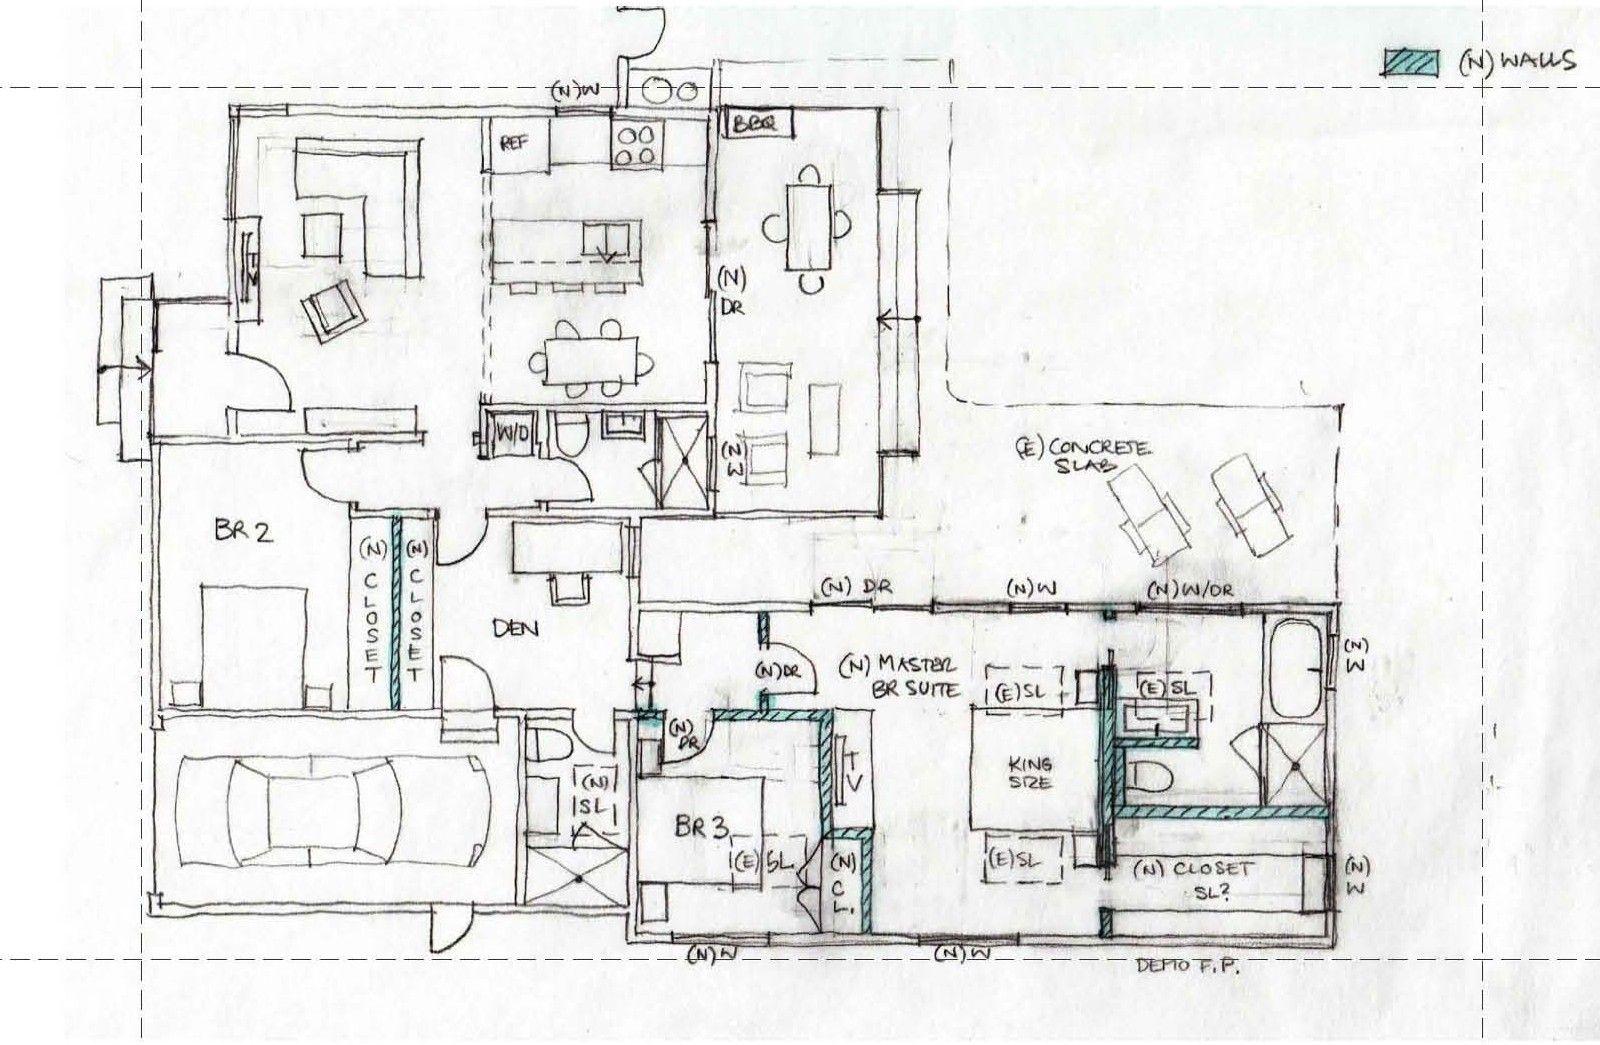 Best Design Easy Interior Design Sketches With 3d Interior